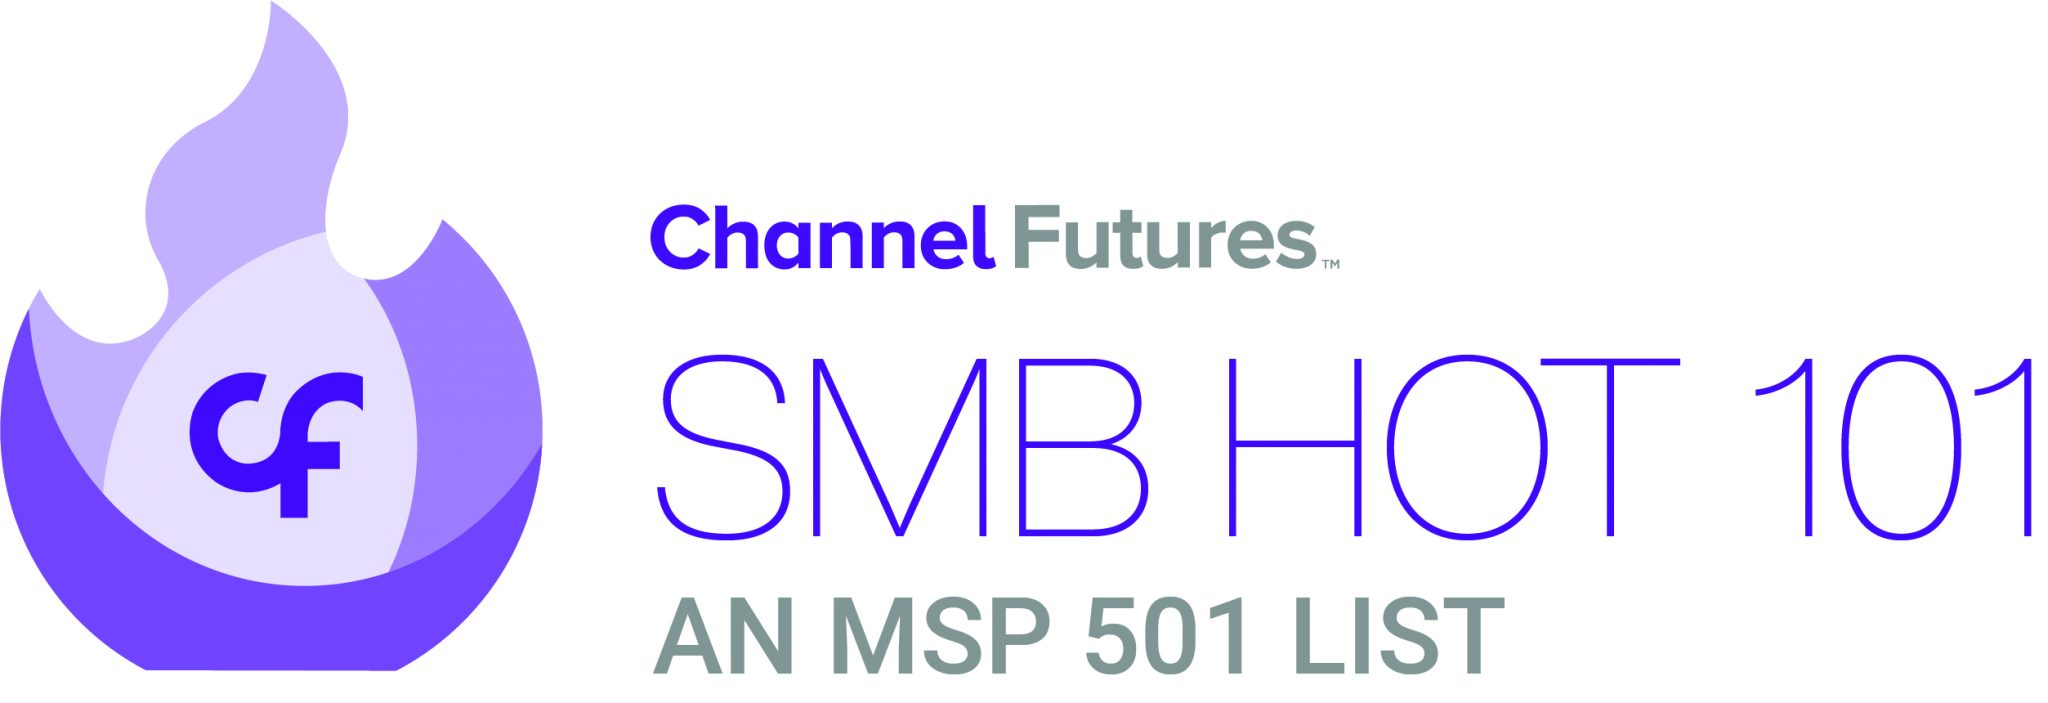 SMB-Hot-101-Logo